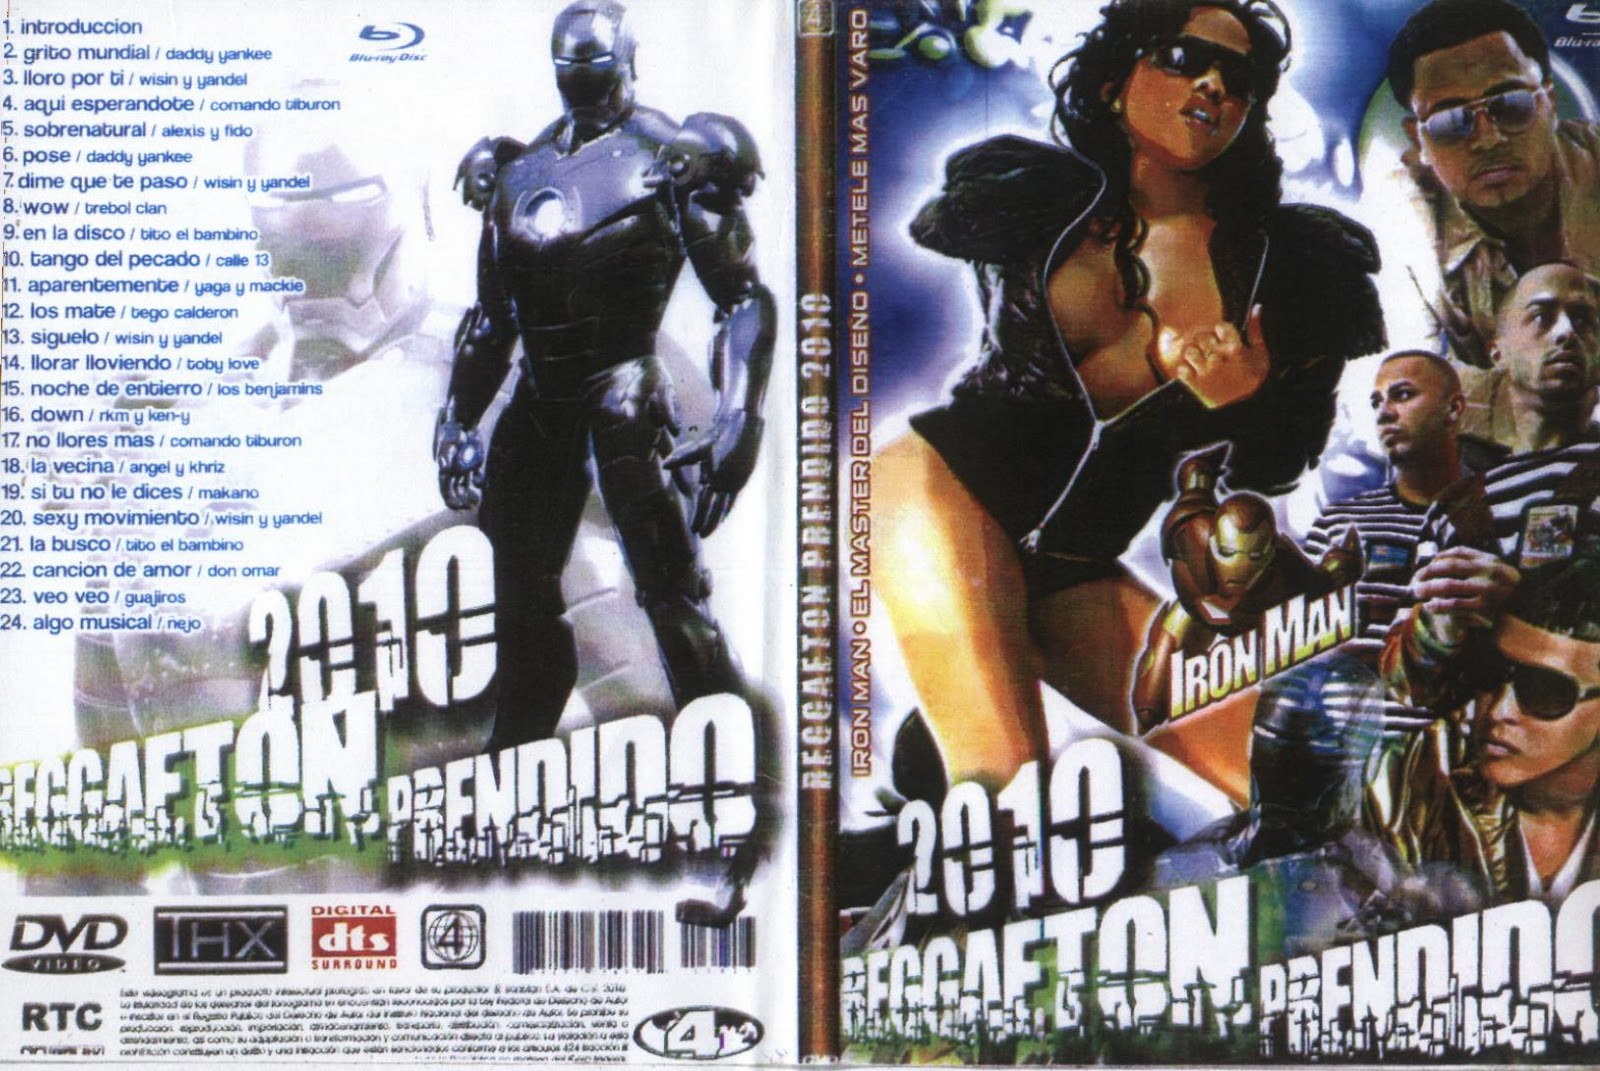 http://3.bp.blogspot.com/_dpj8cXZxGgs/TMNC31nAhXI/AAAAAAAAAJw/O68JztEzrmo/s1600/reggaeton+prendido+2010.JPG